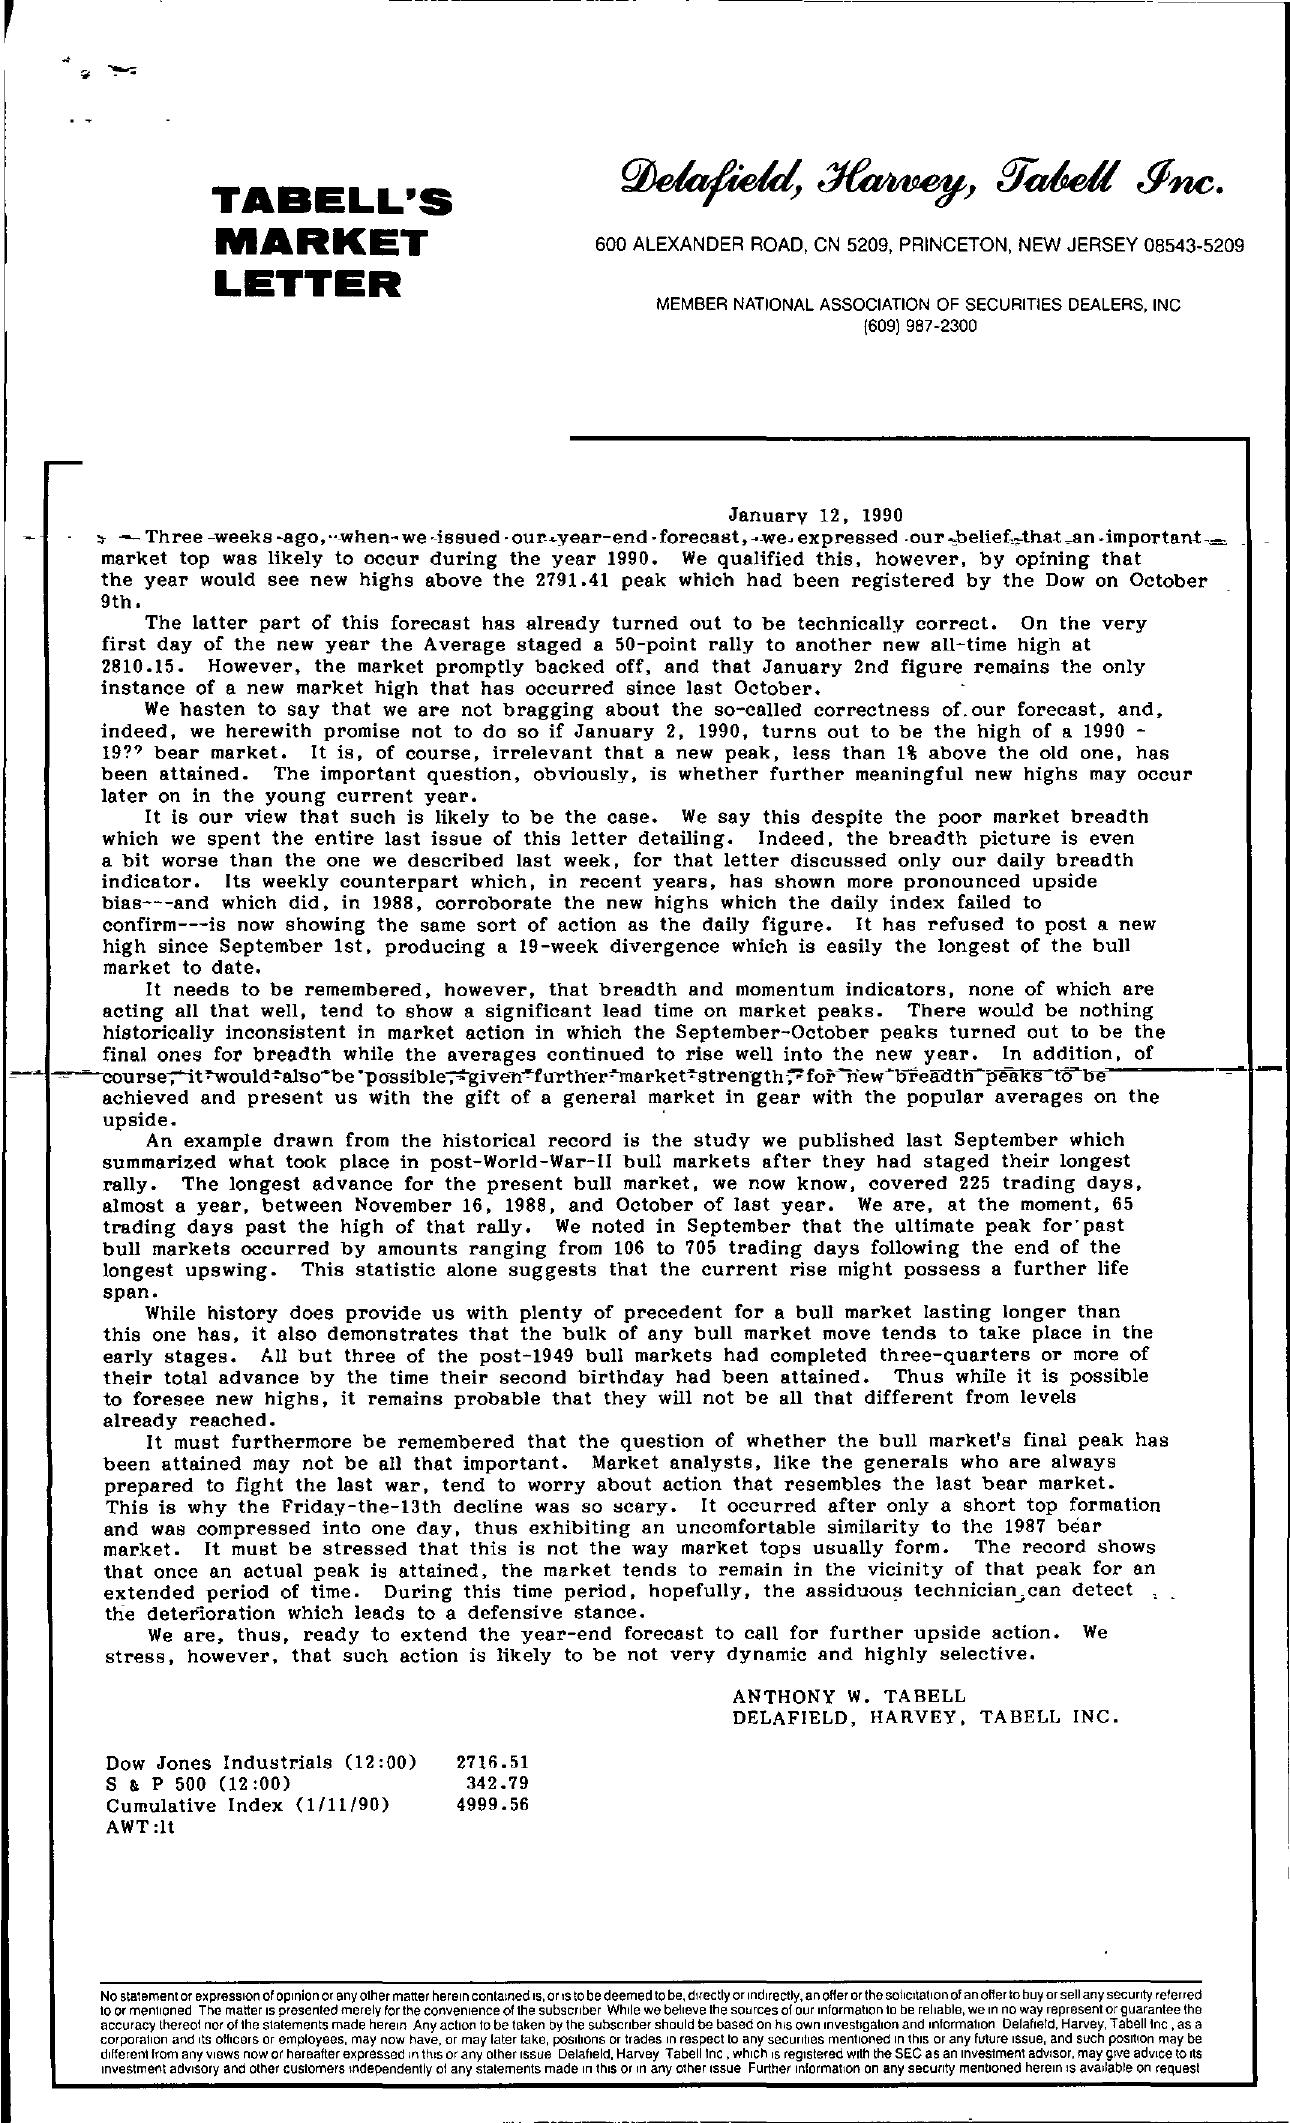 Tabell's Market Letter - January 12, 1990